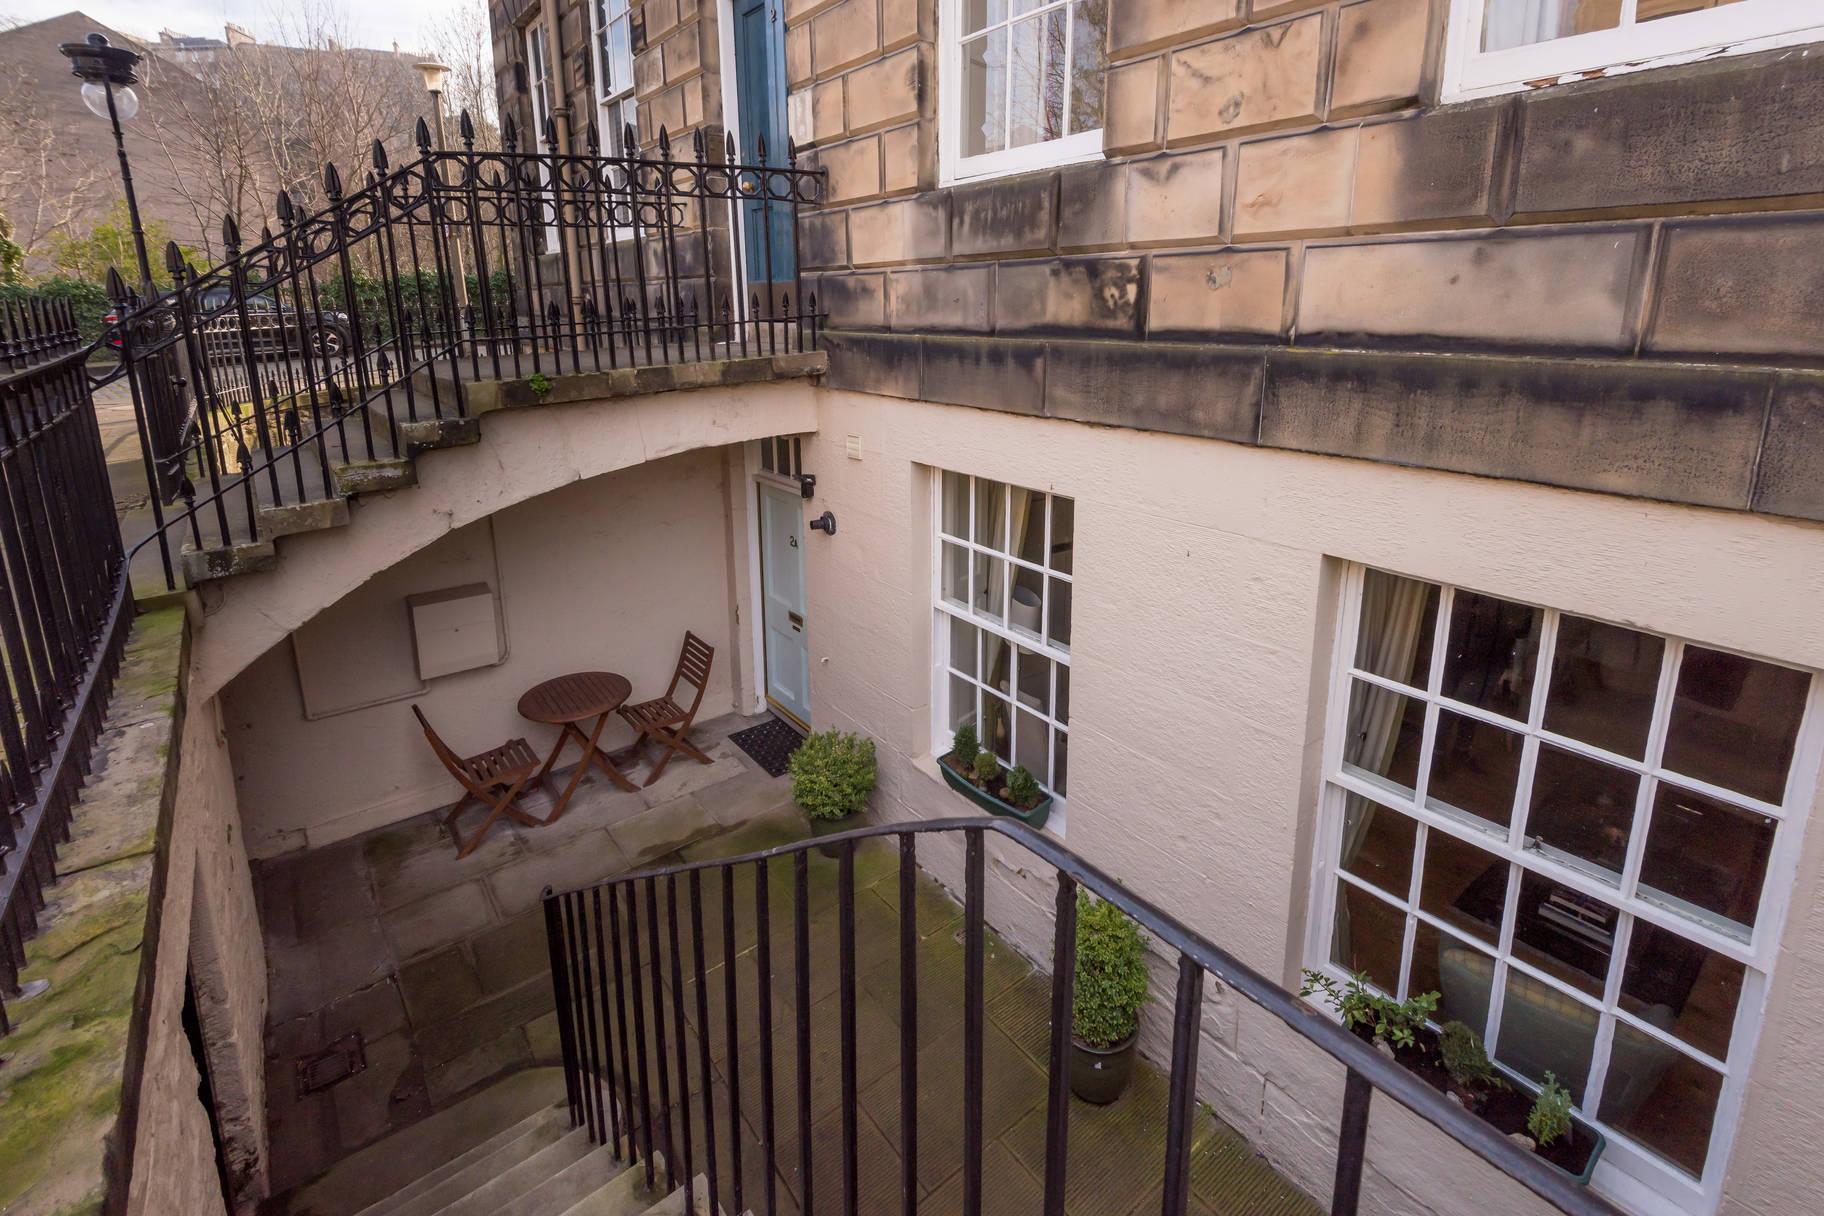 2A Carlton Street, Stockbridge, Edinburgh, EH4 1NJ